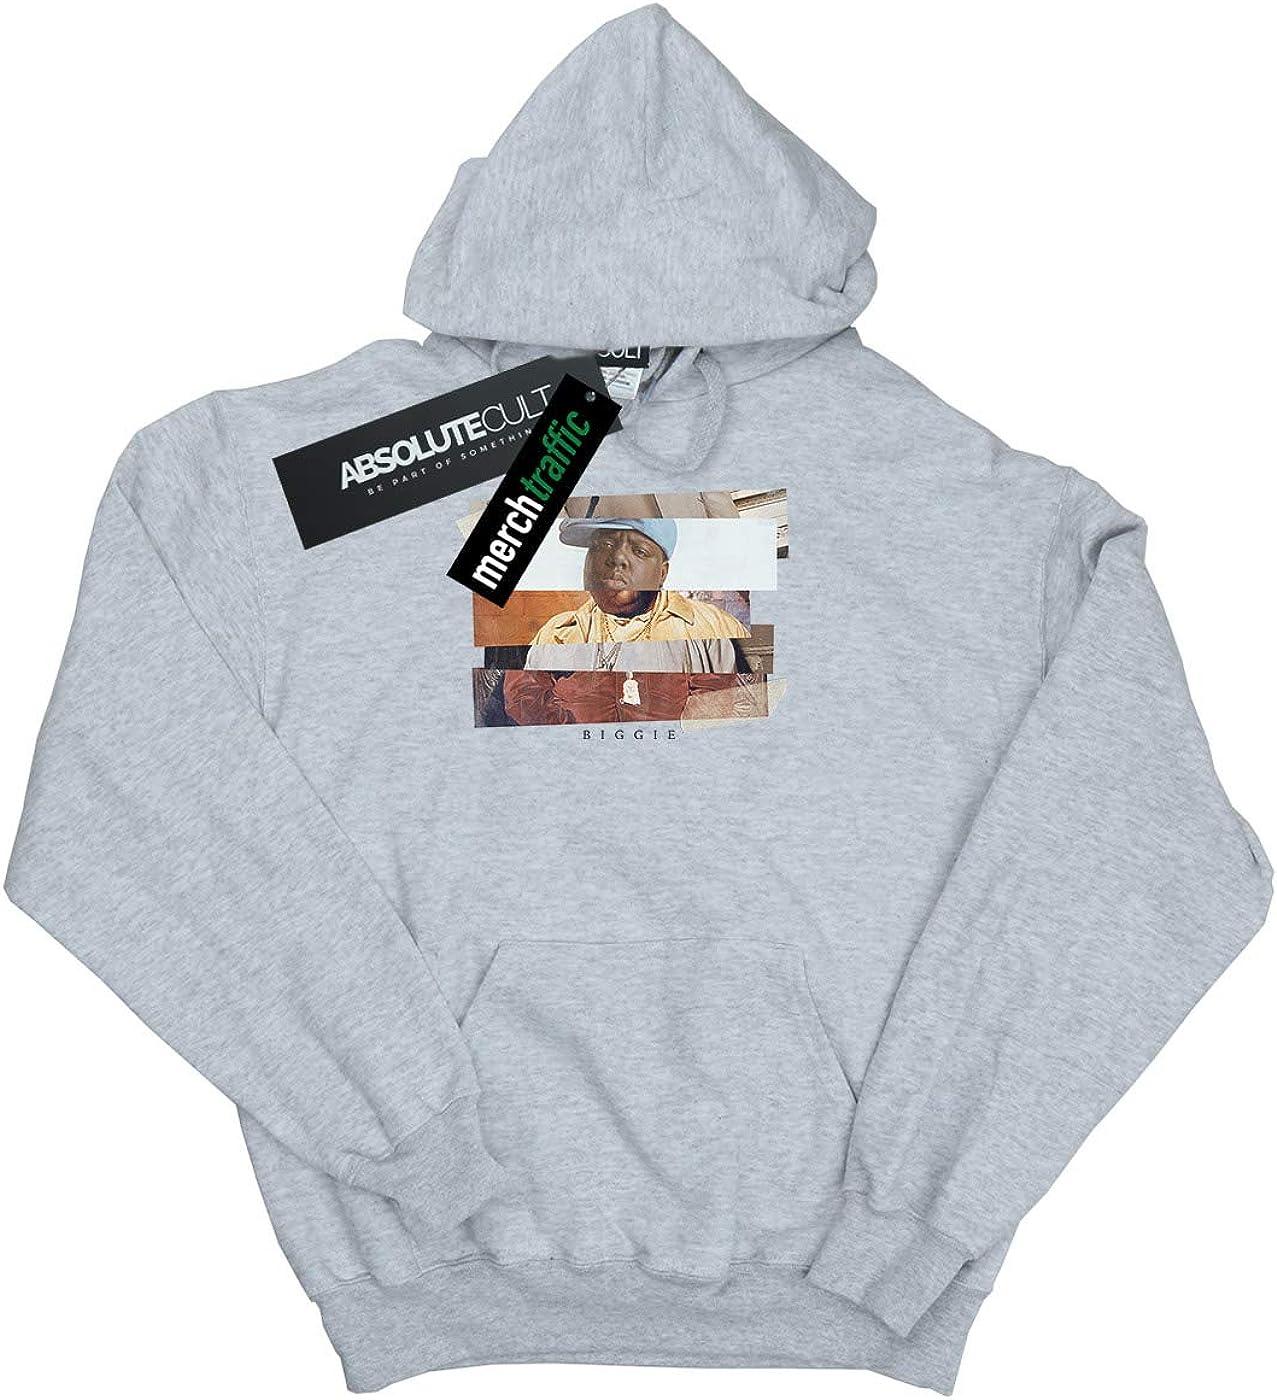 ABSOLUTECULT Notorious Big Girls Sliced Photo Sweatshirt